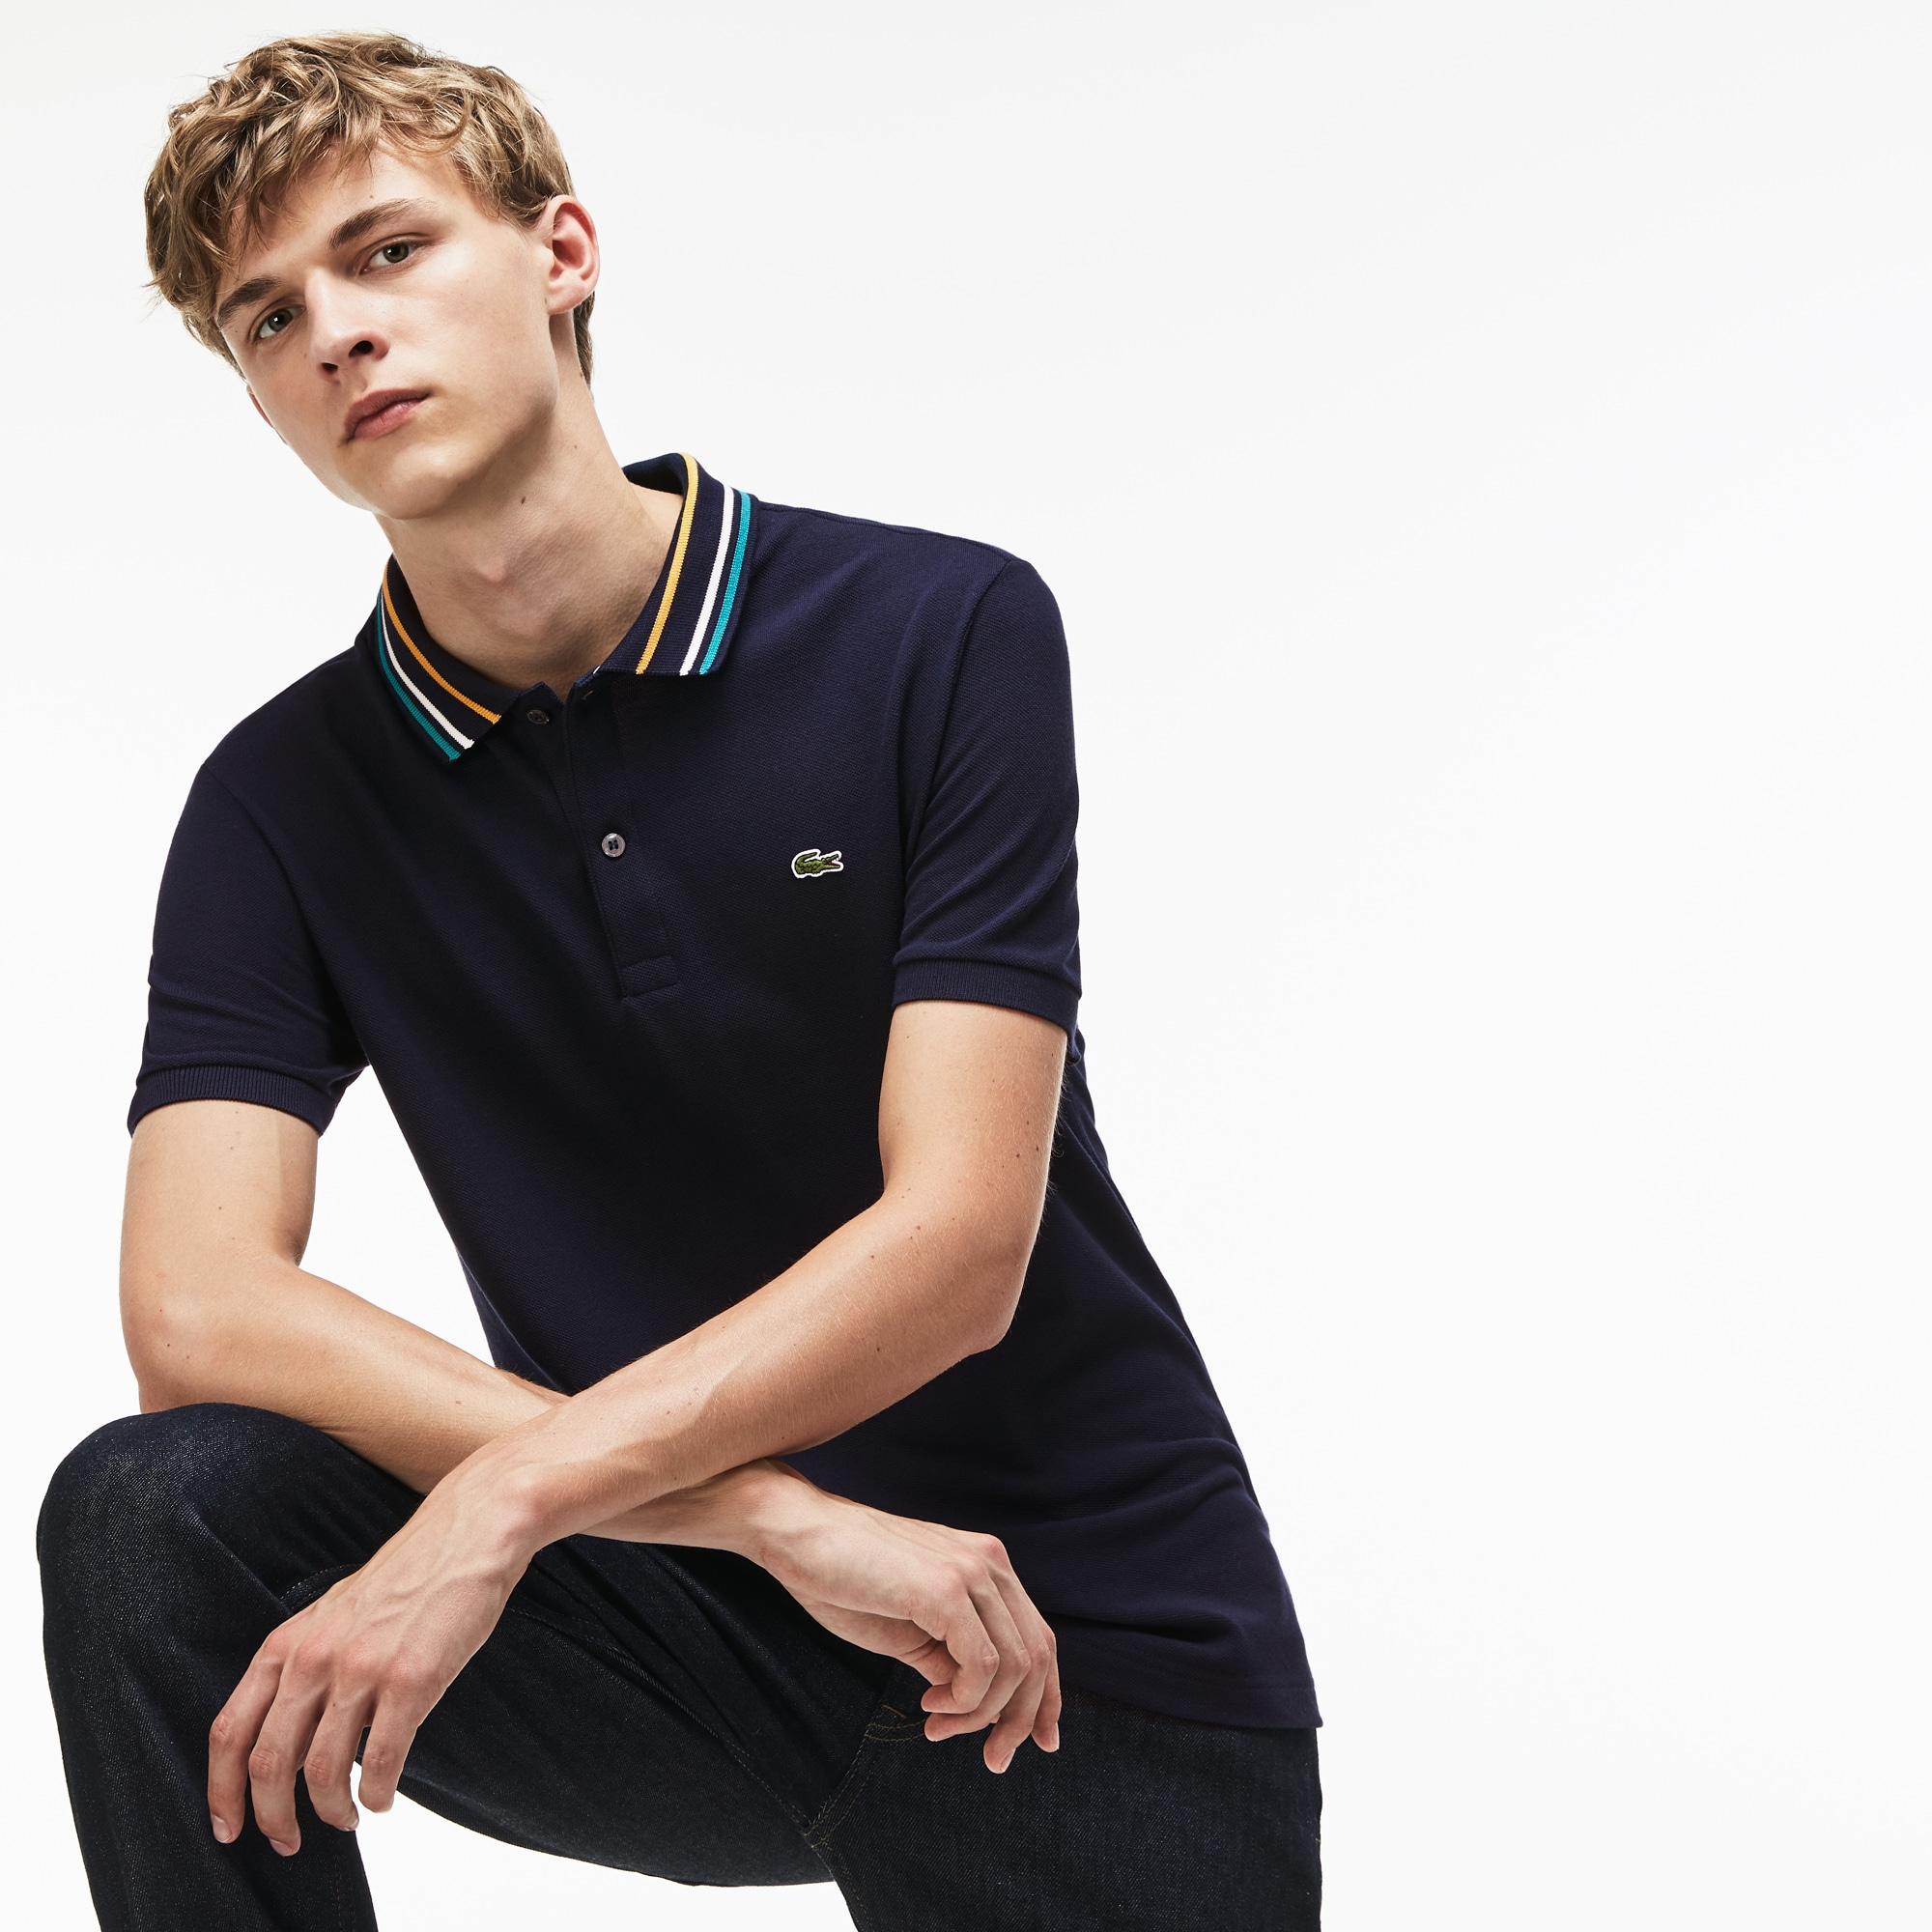 394f20a545 Slim fit Polo shirts | Men Fashion | LACOSTE